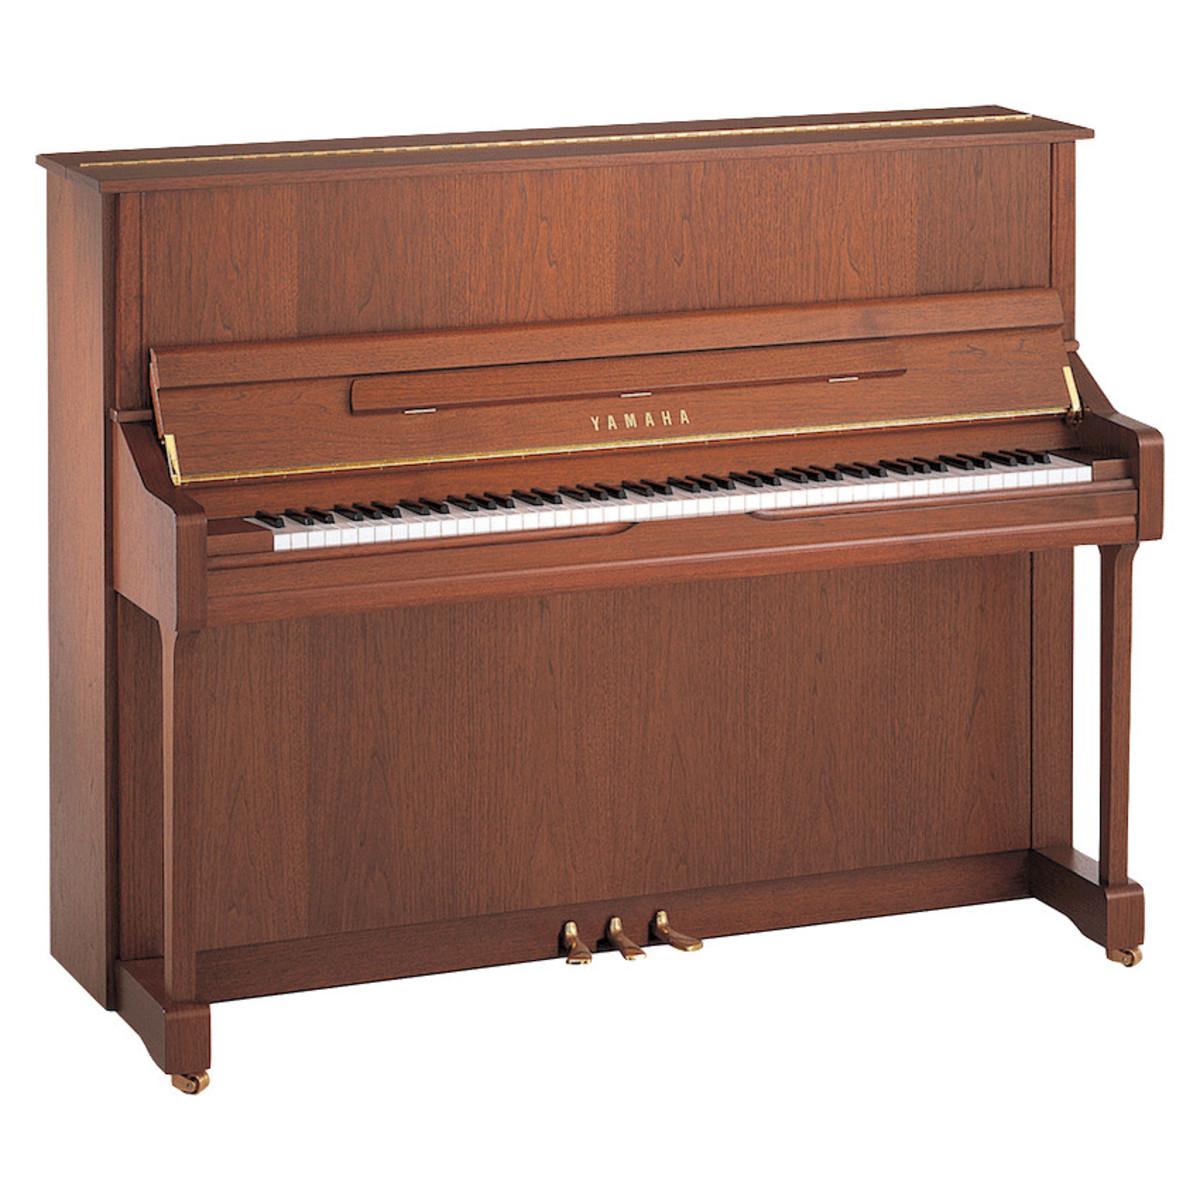 Yamaha u1 upright piano open pore american walnut at for Yamaha upright piano models